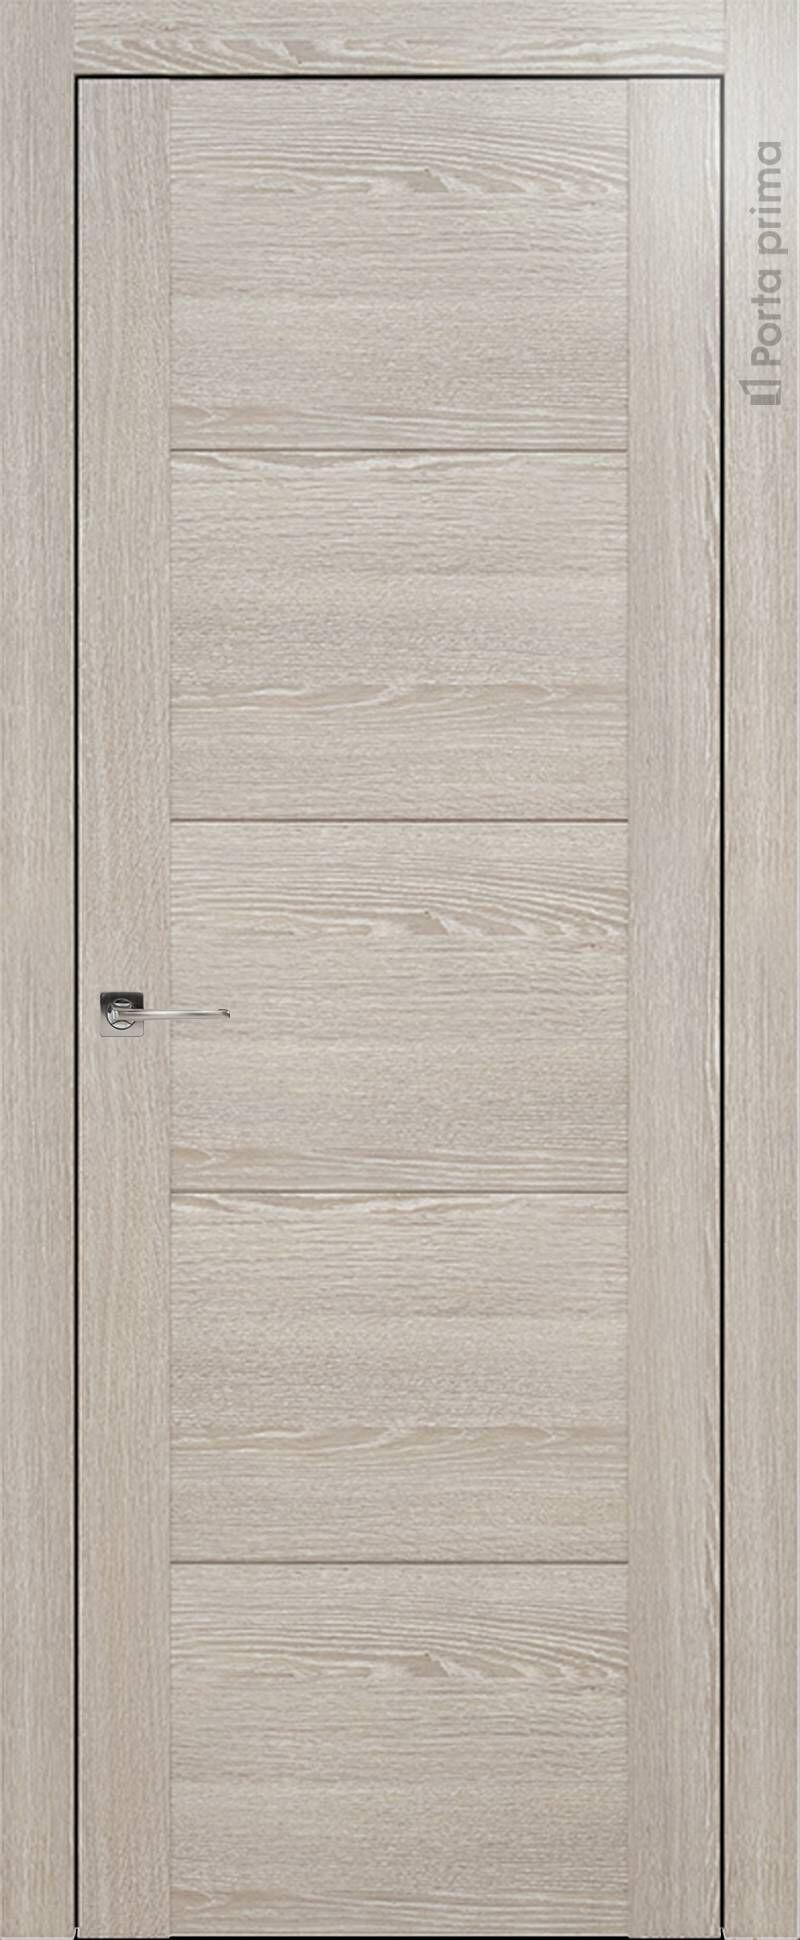 Maggiore цвет - Серый дуб Без стекла (ДГ)